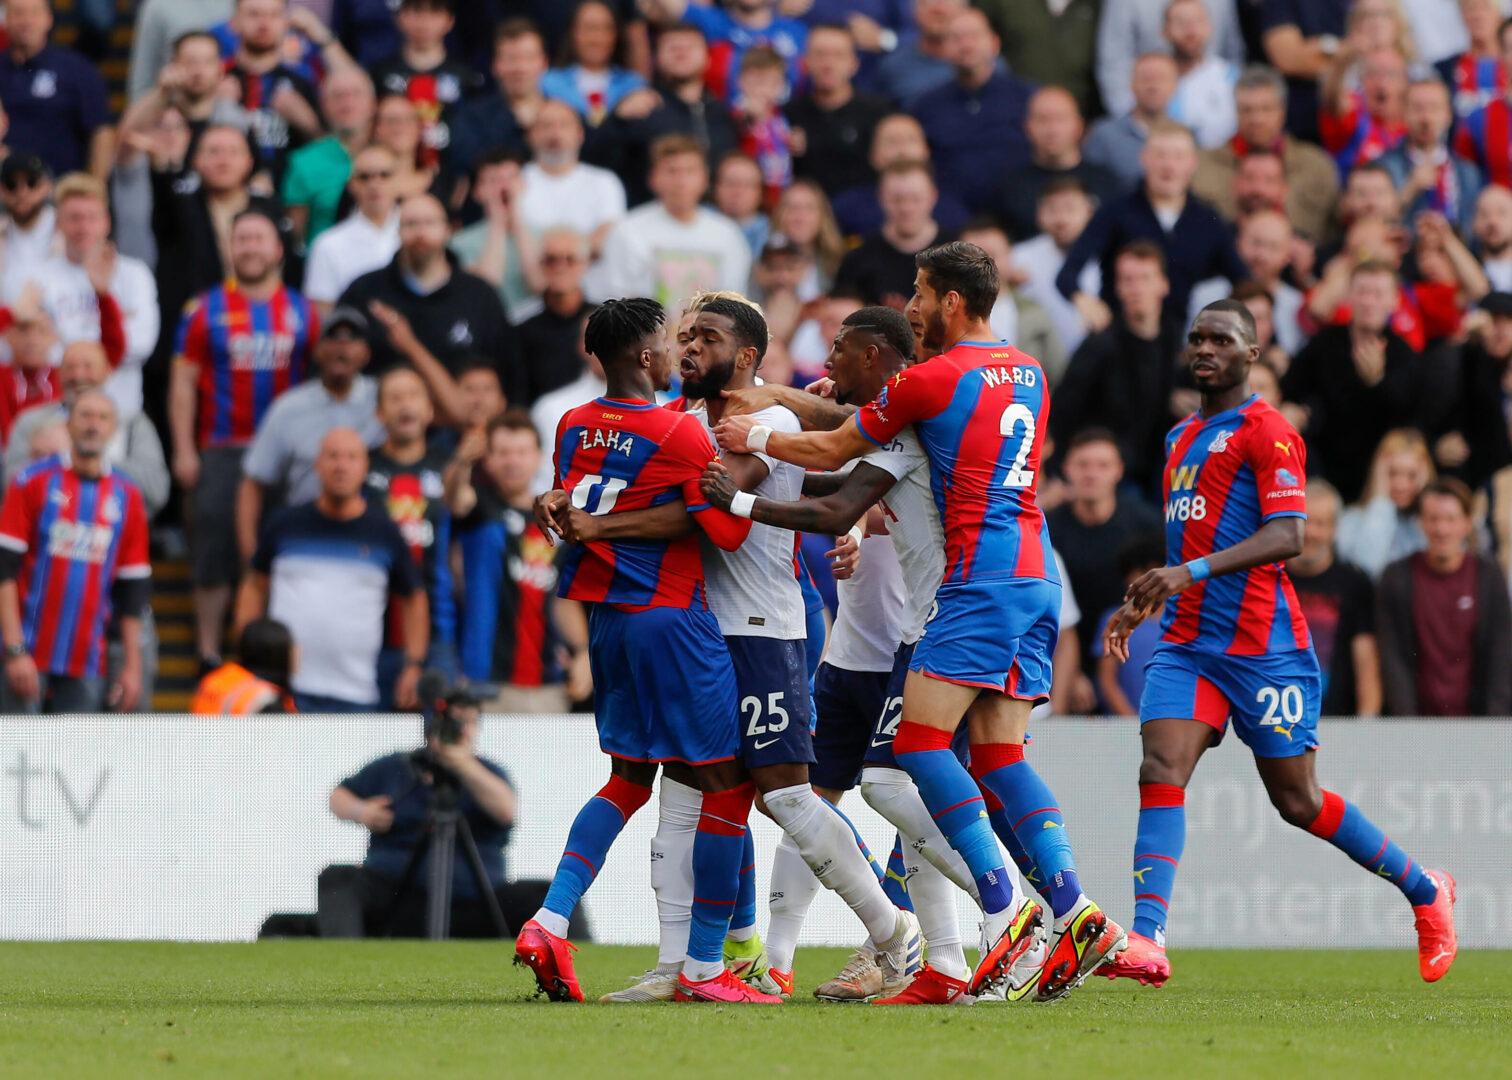 Zaha & Edouard! Crystal Palace fügt Tottenham erste Niederlage zu